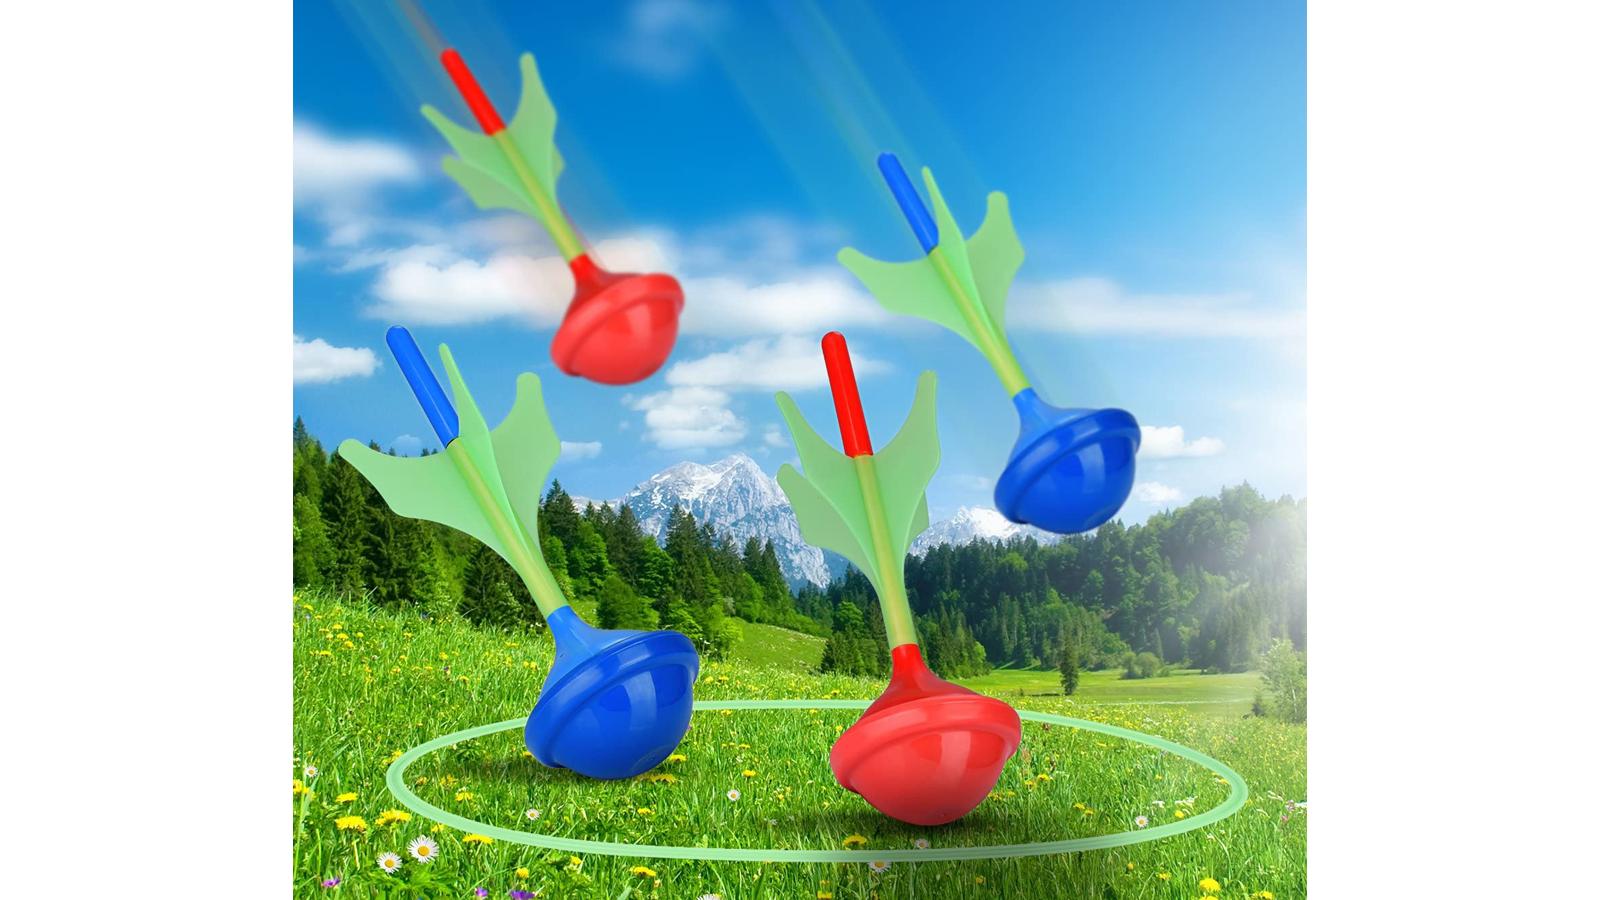 Lawn darts flying through the air towards glow in the dark target rings